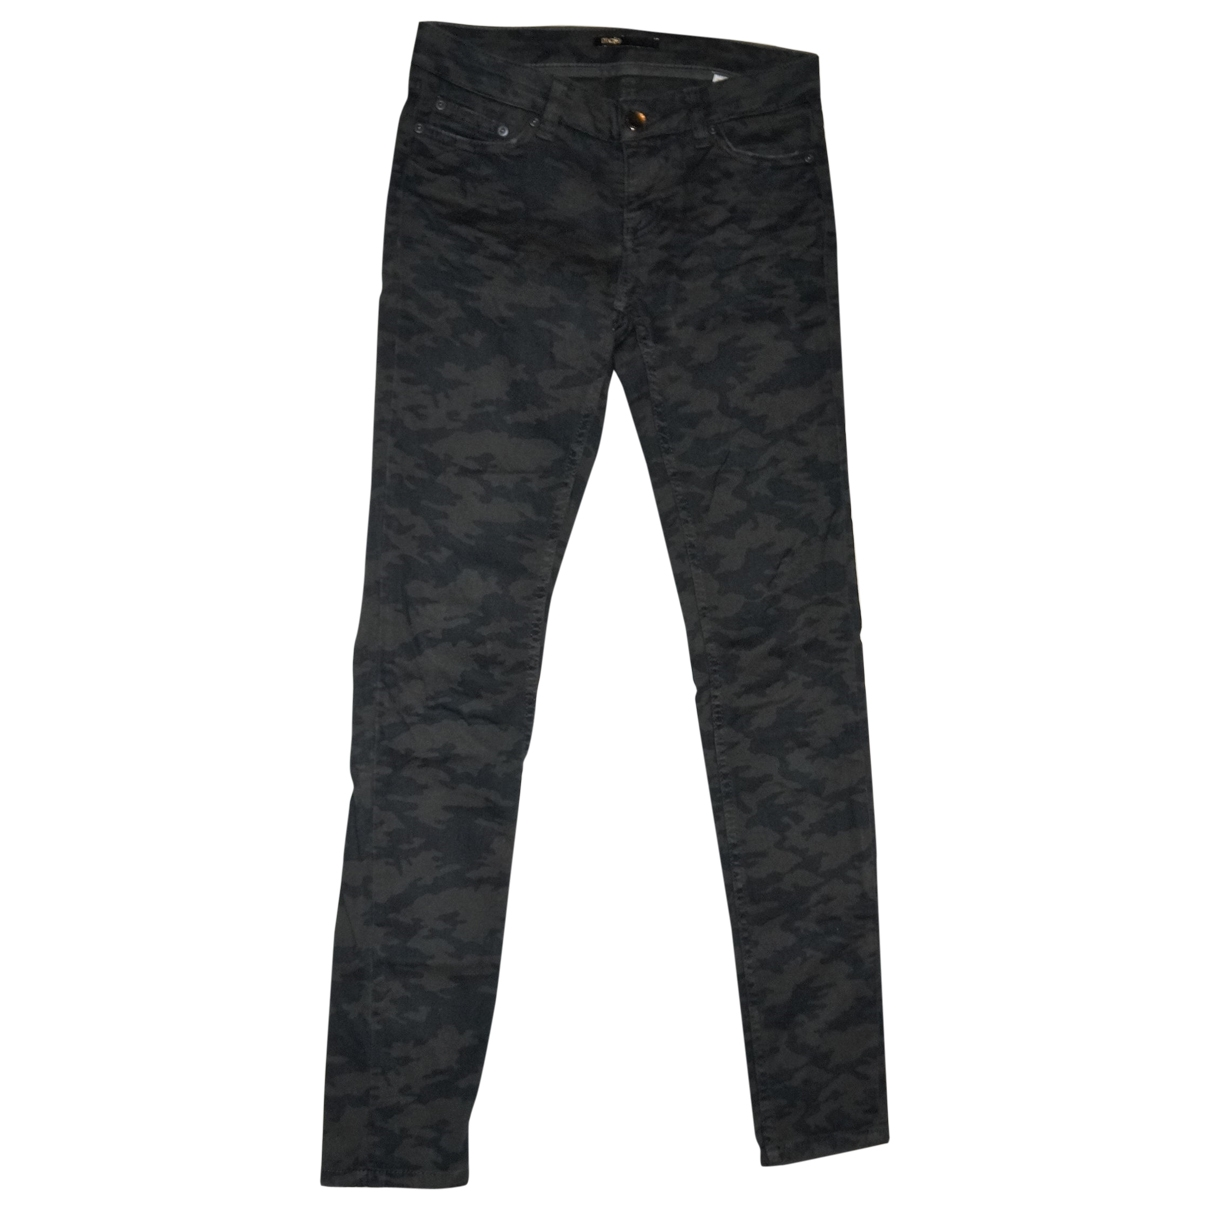 Maje \N Khaki Cotton - elasthane Jeans for Women 36 FR